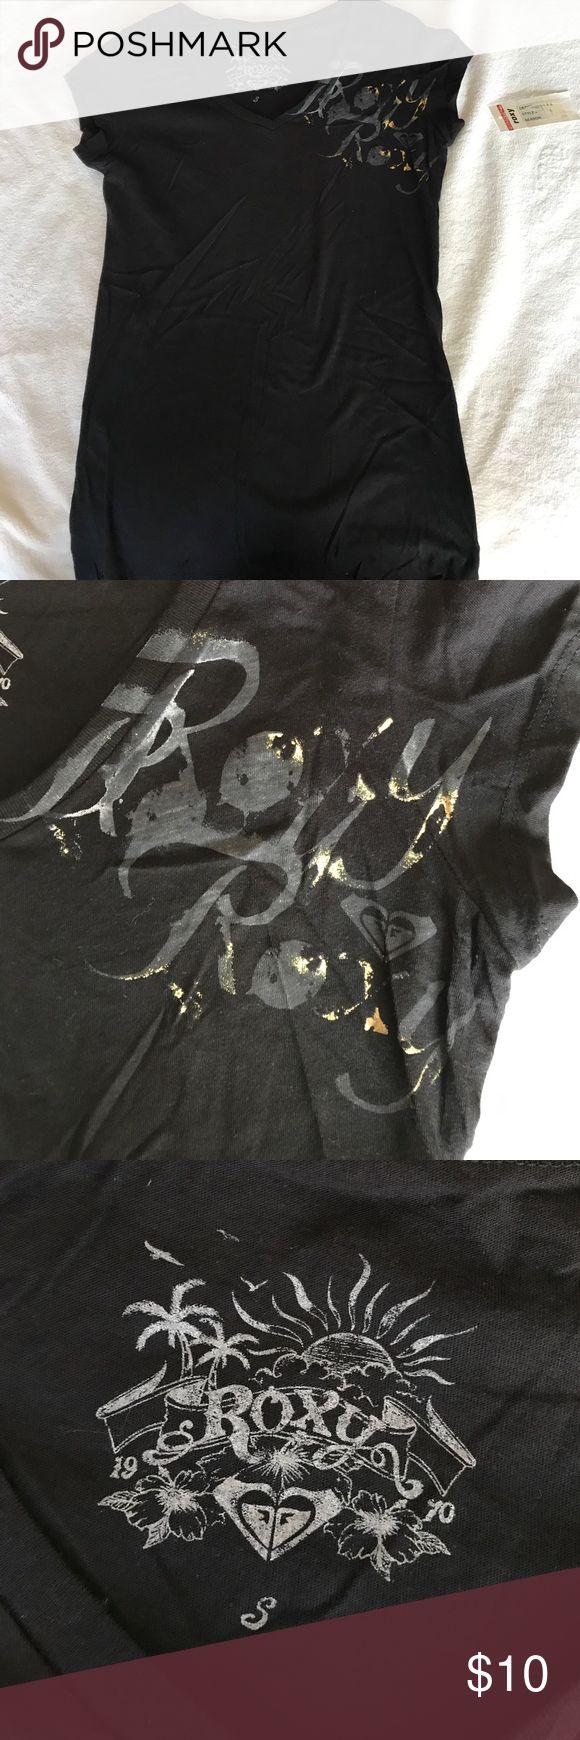 Roxy NWT black soft V-neck tshirt Roxy NWT black soft V-neck tshirt. Roxy logo lettering screen print on left shirt, has gold metallic ink hits. Tag is printed on the inside. Size juniors S. Smoke free home. Roxy Tops Tees - Short Sleeve